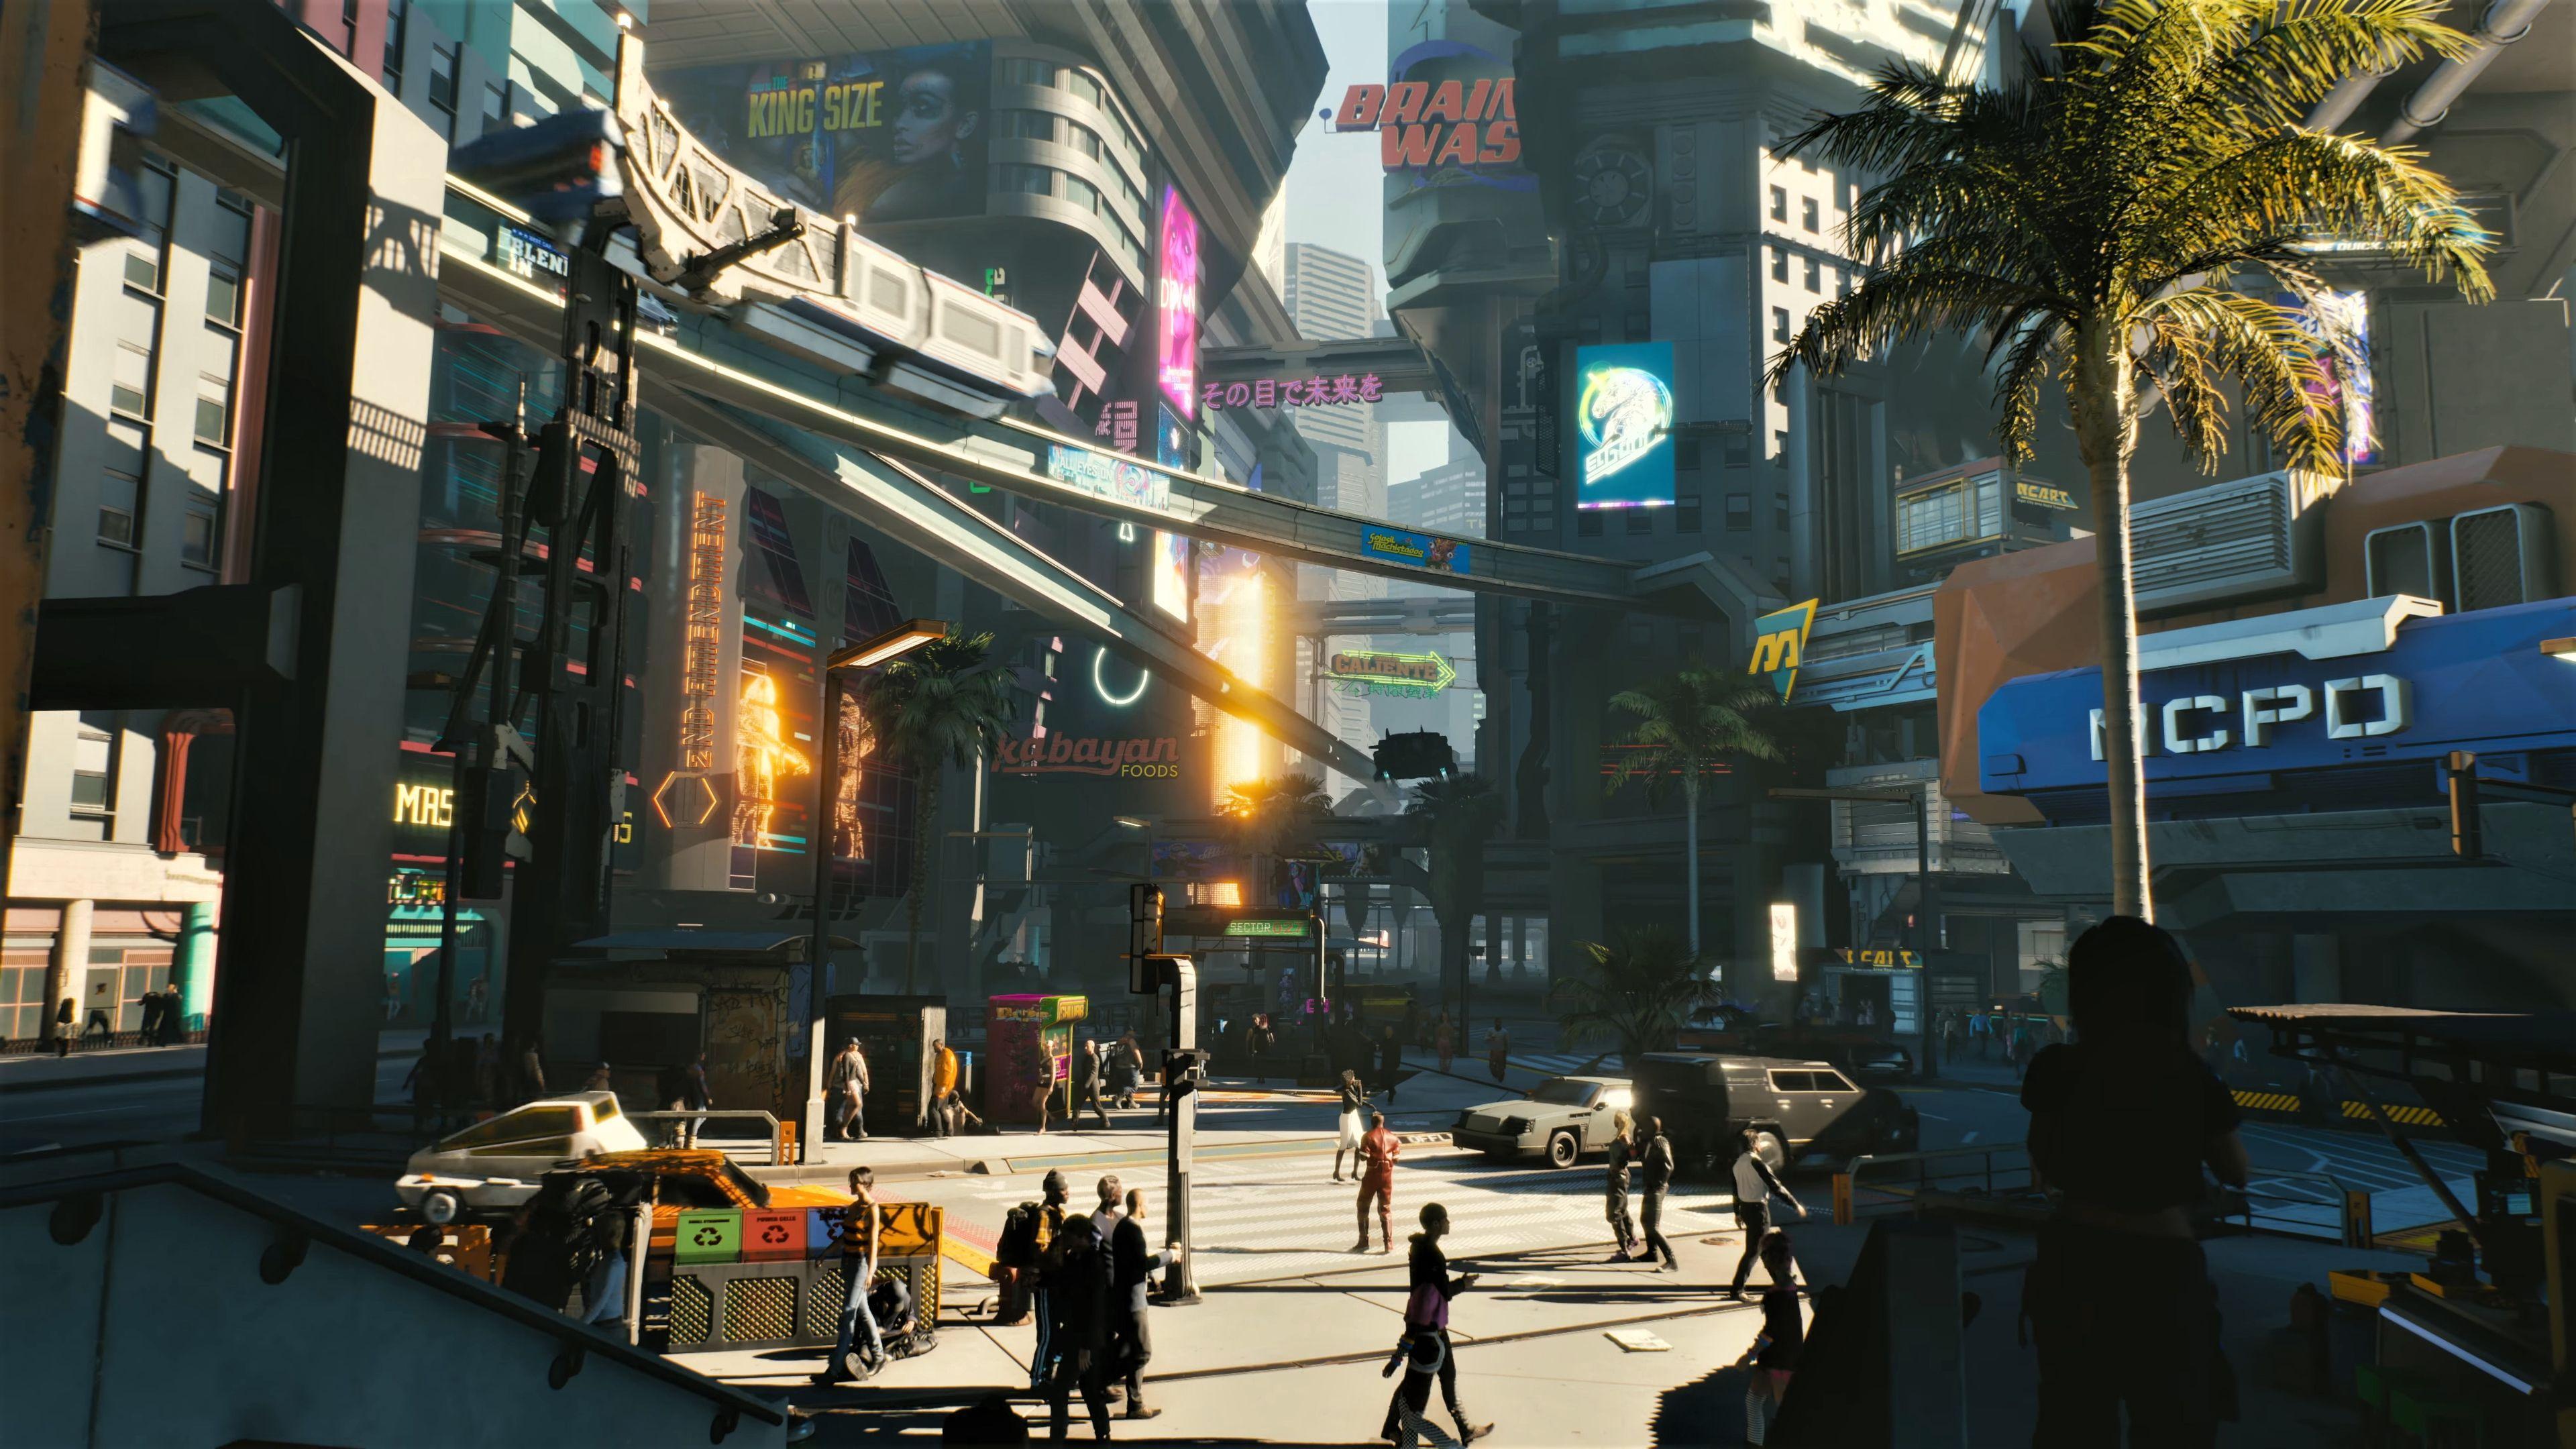 Cyberpunk City 4k Hd Wallpapers Digital Art Wallpapers In 2020 Cyberpunk City City Wallpaper Cyberpunk 2077